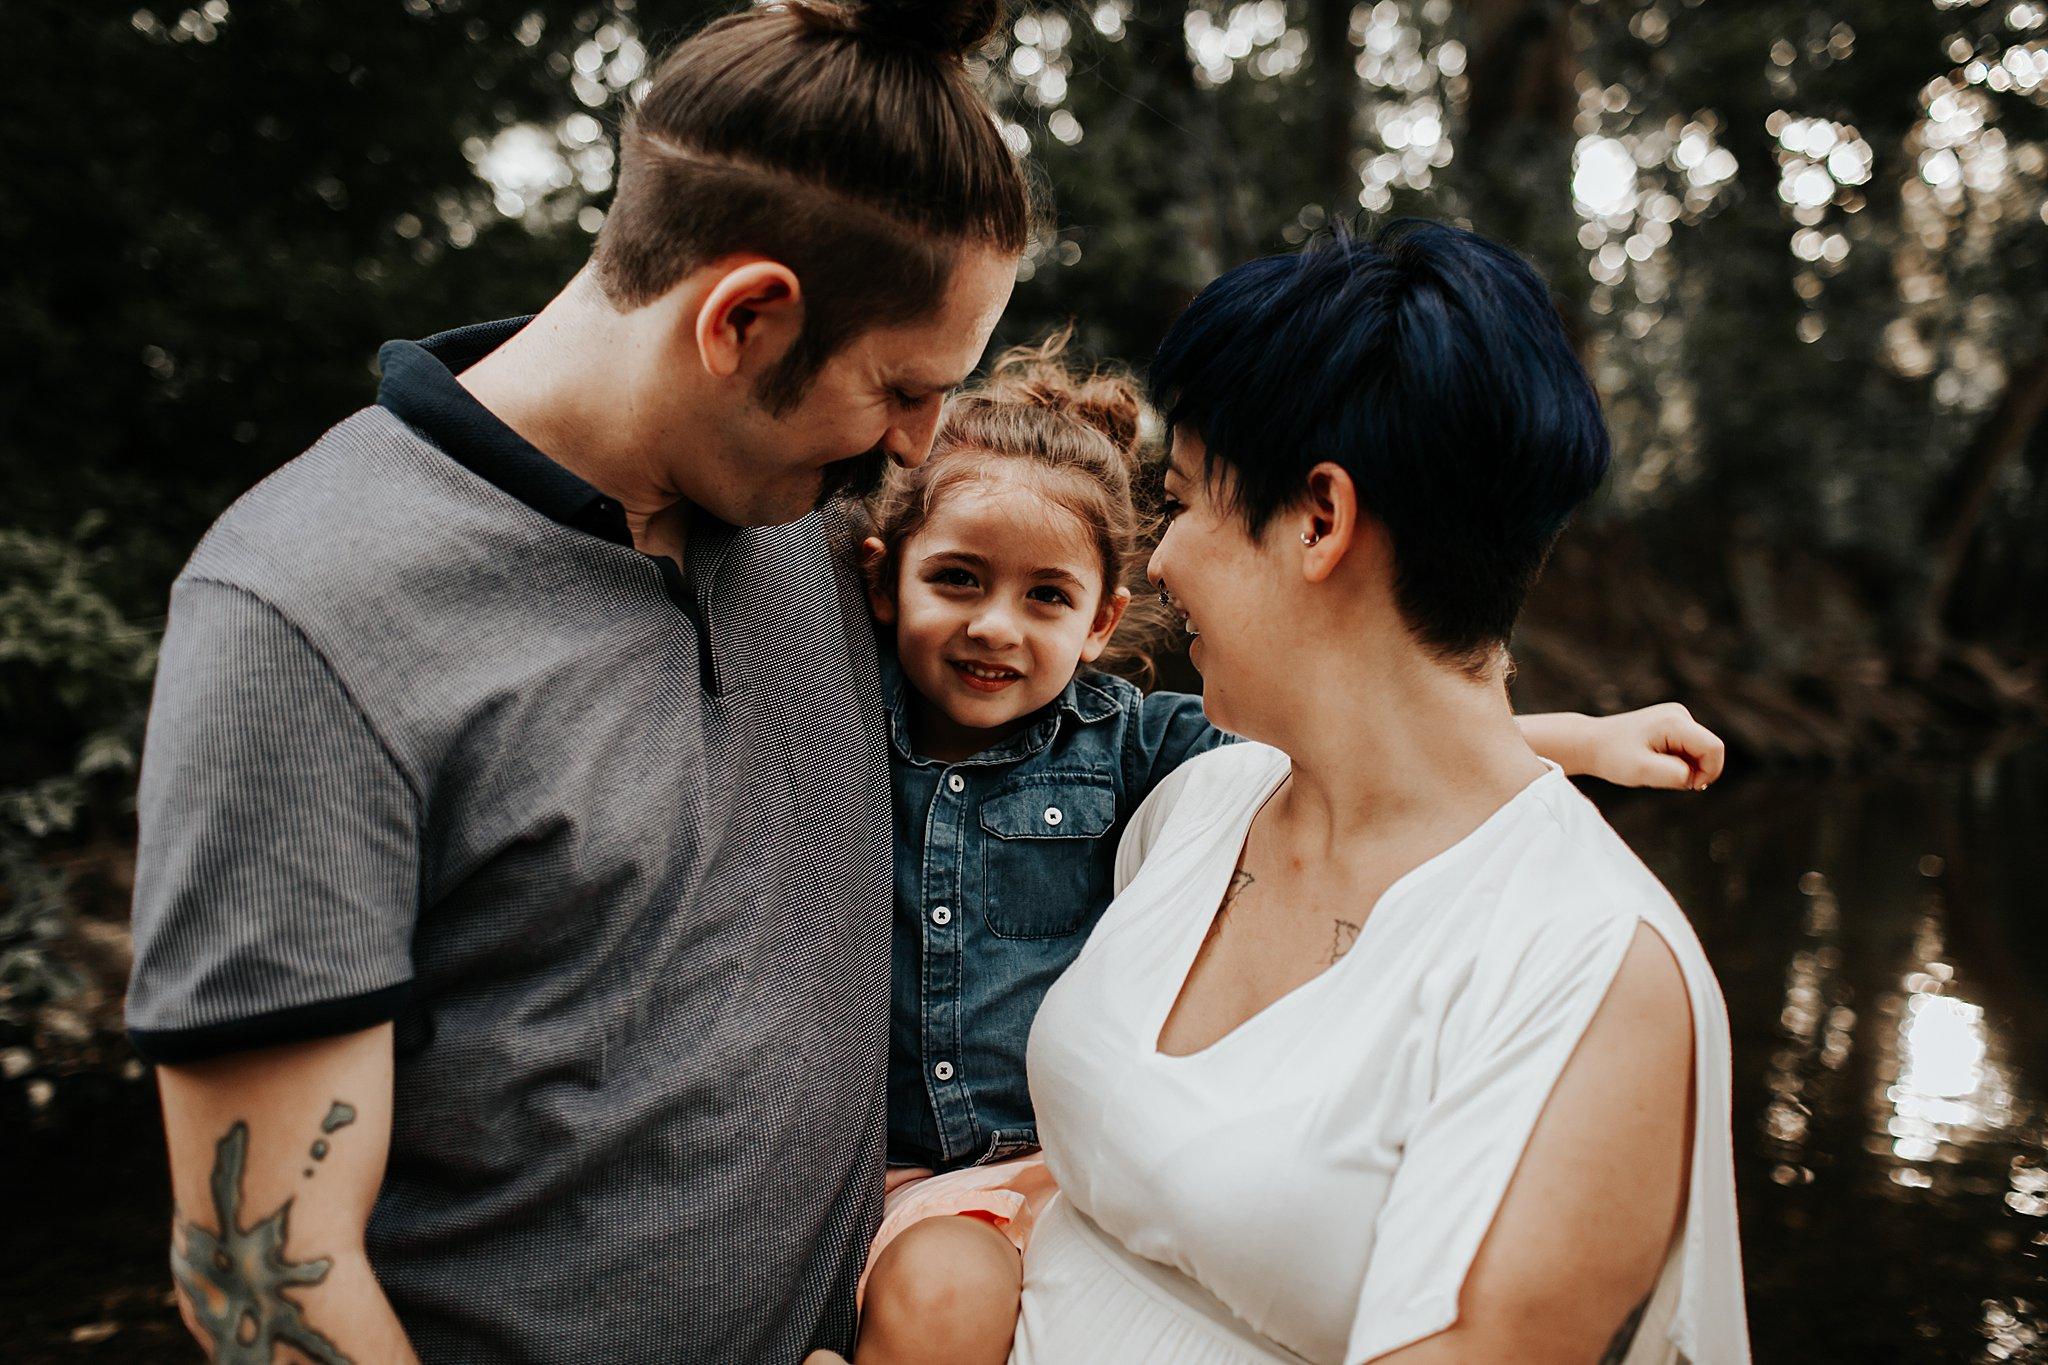 Meagan-San-Antonio-Maternity-Photographer-21_WEB.jpg